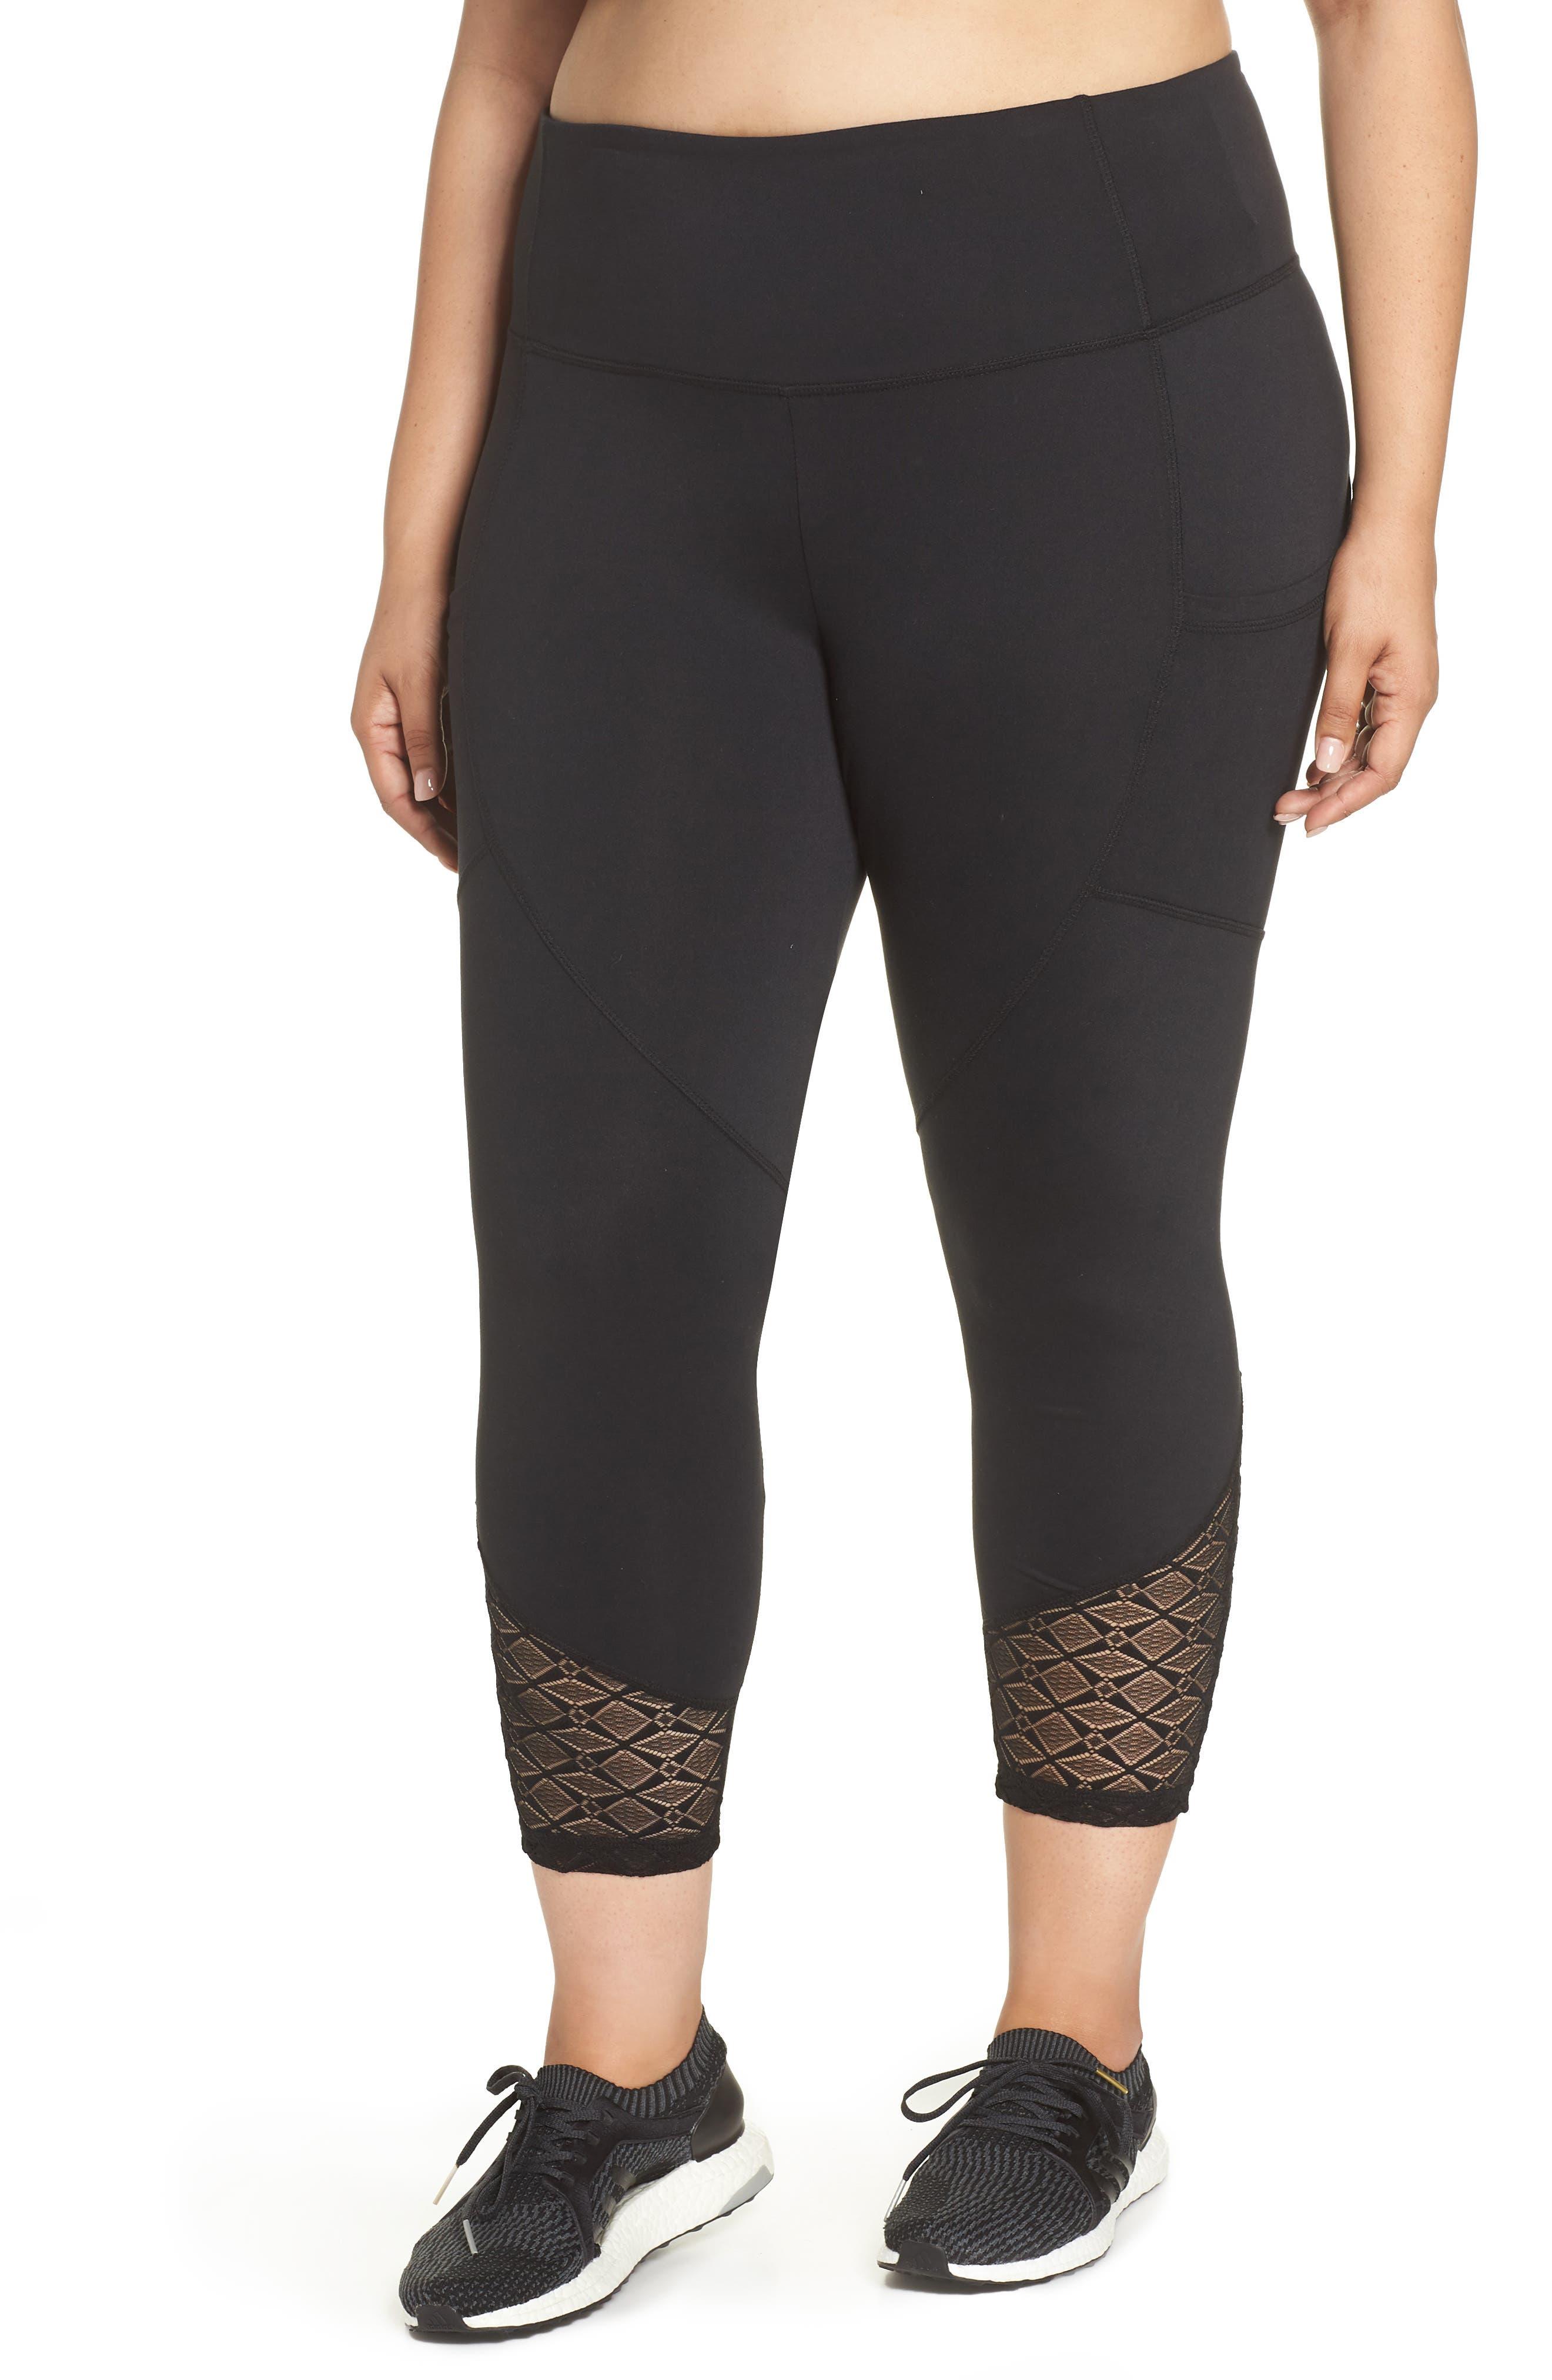 Evie Capri Leggings,                         Main,                         color, BLACK